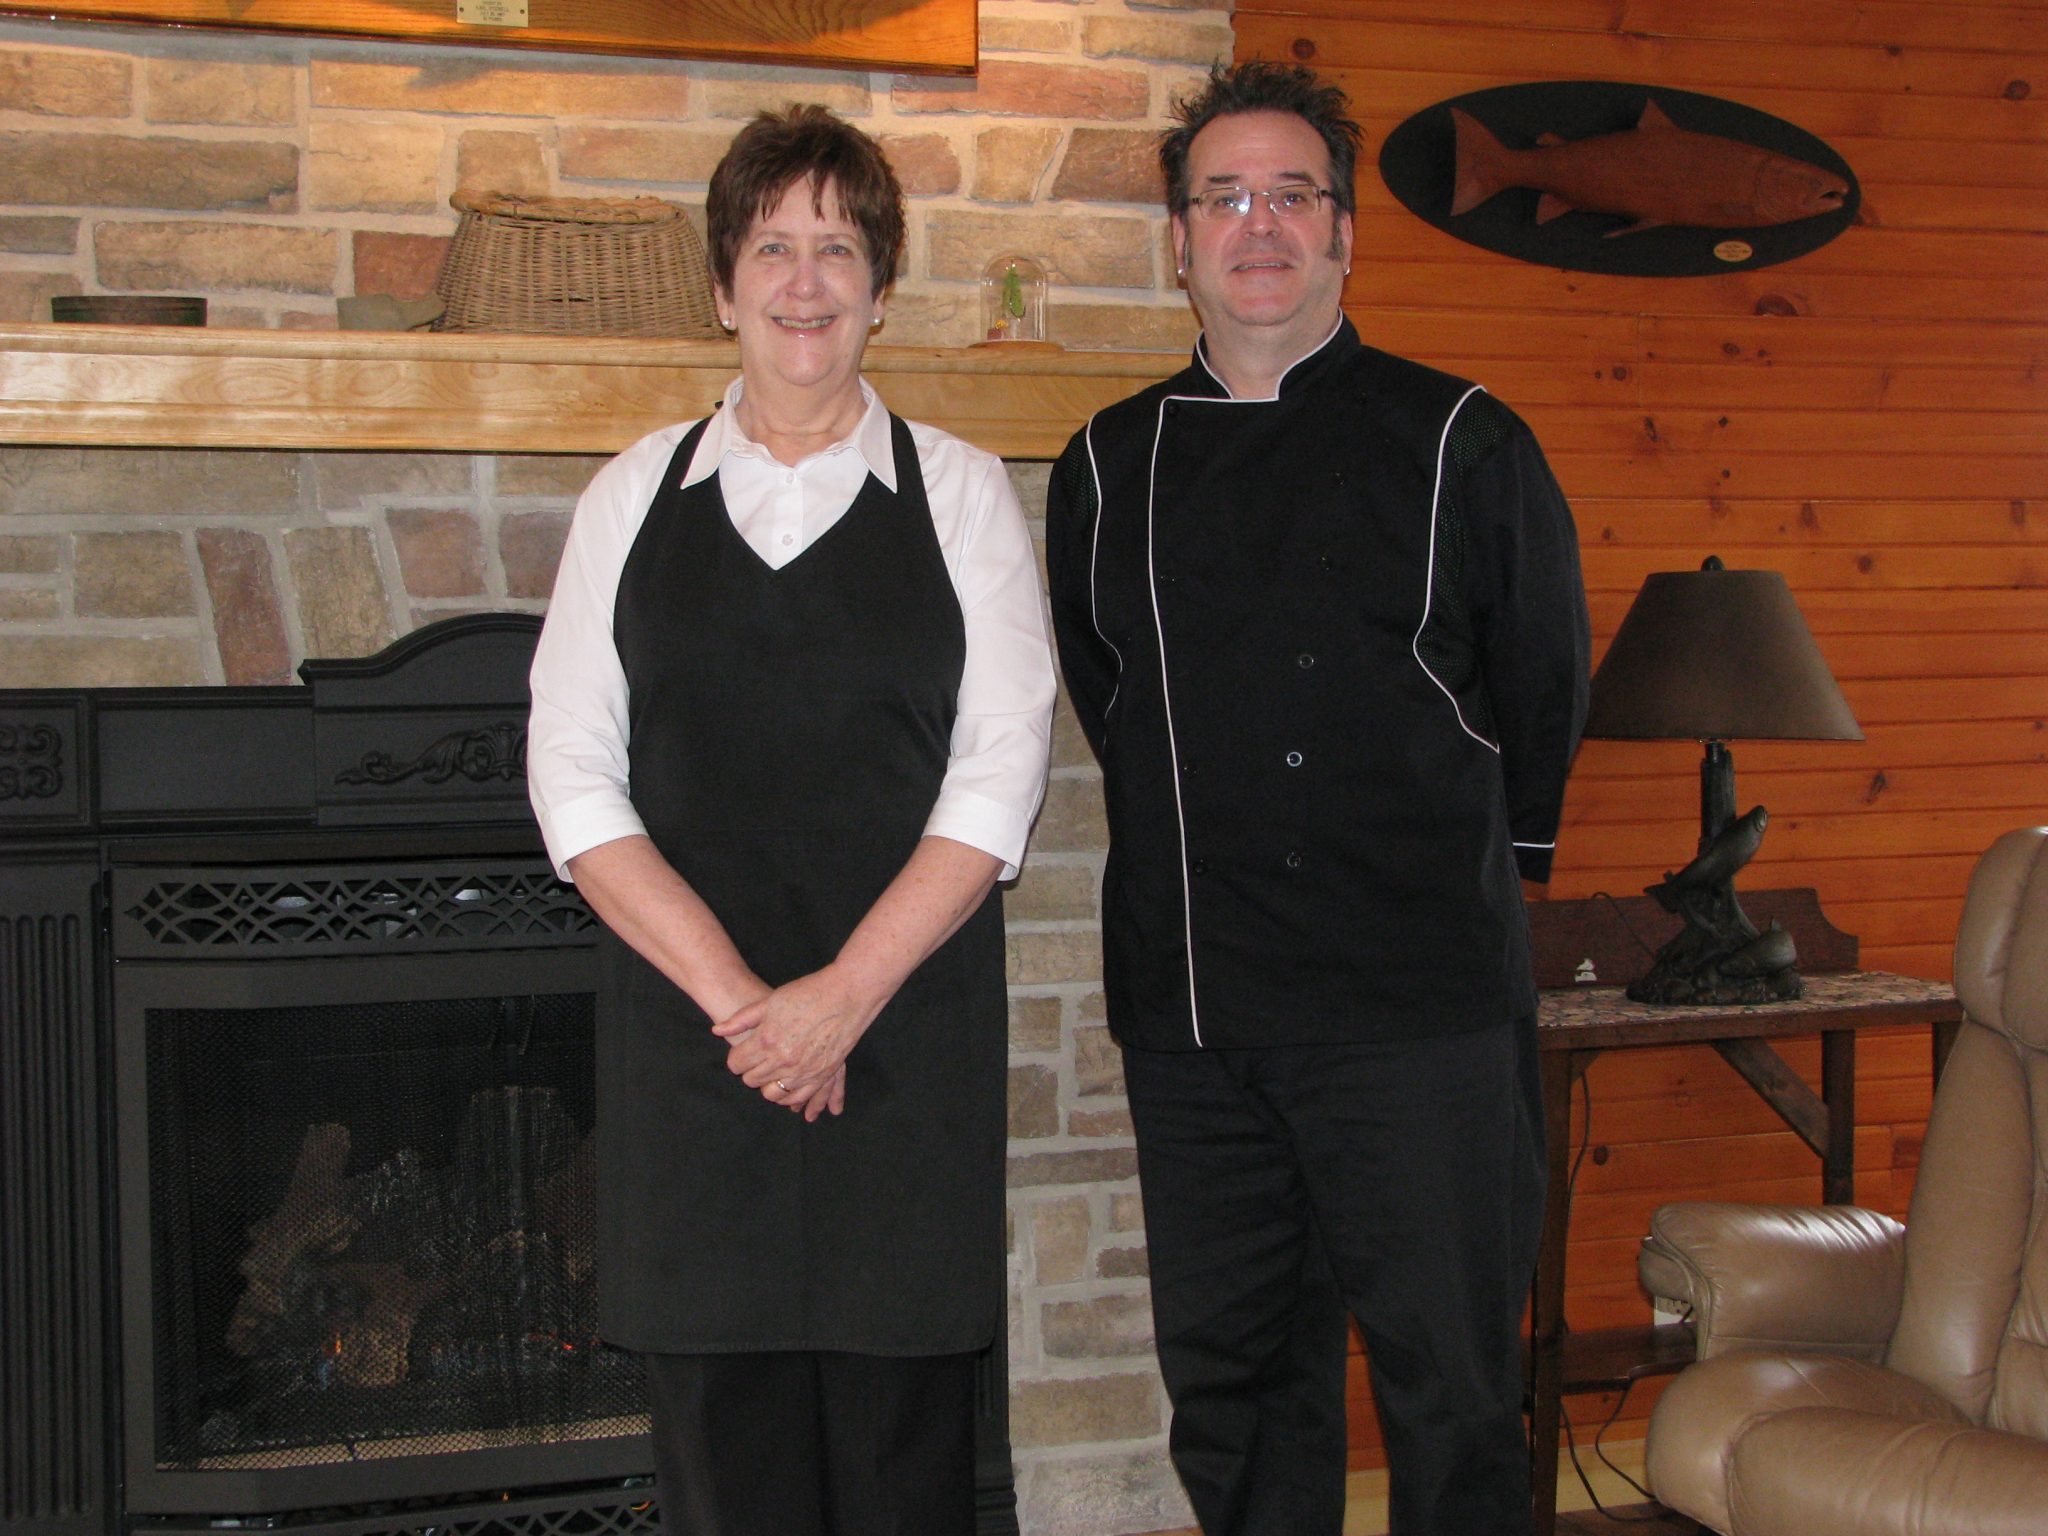 Chef pics2 003